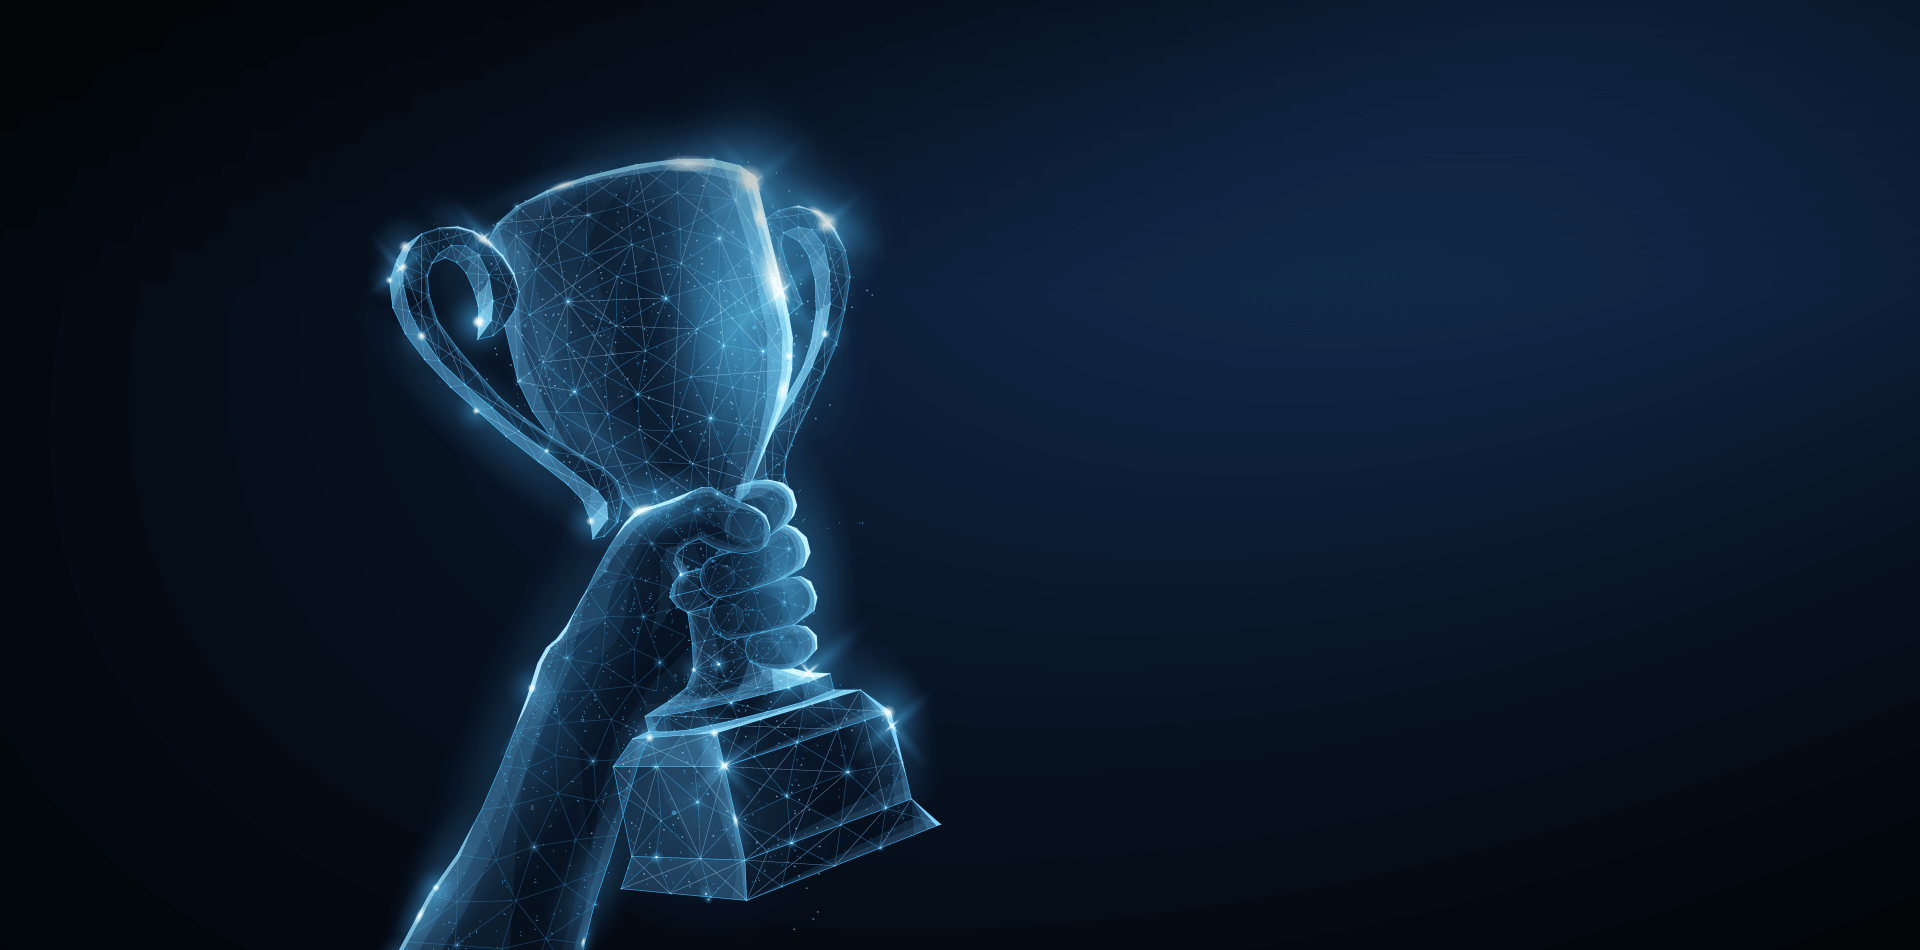 Raising the trophy award